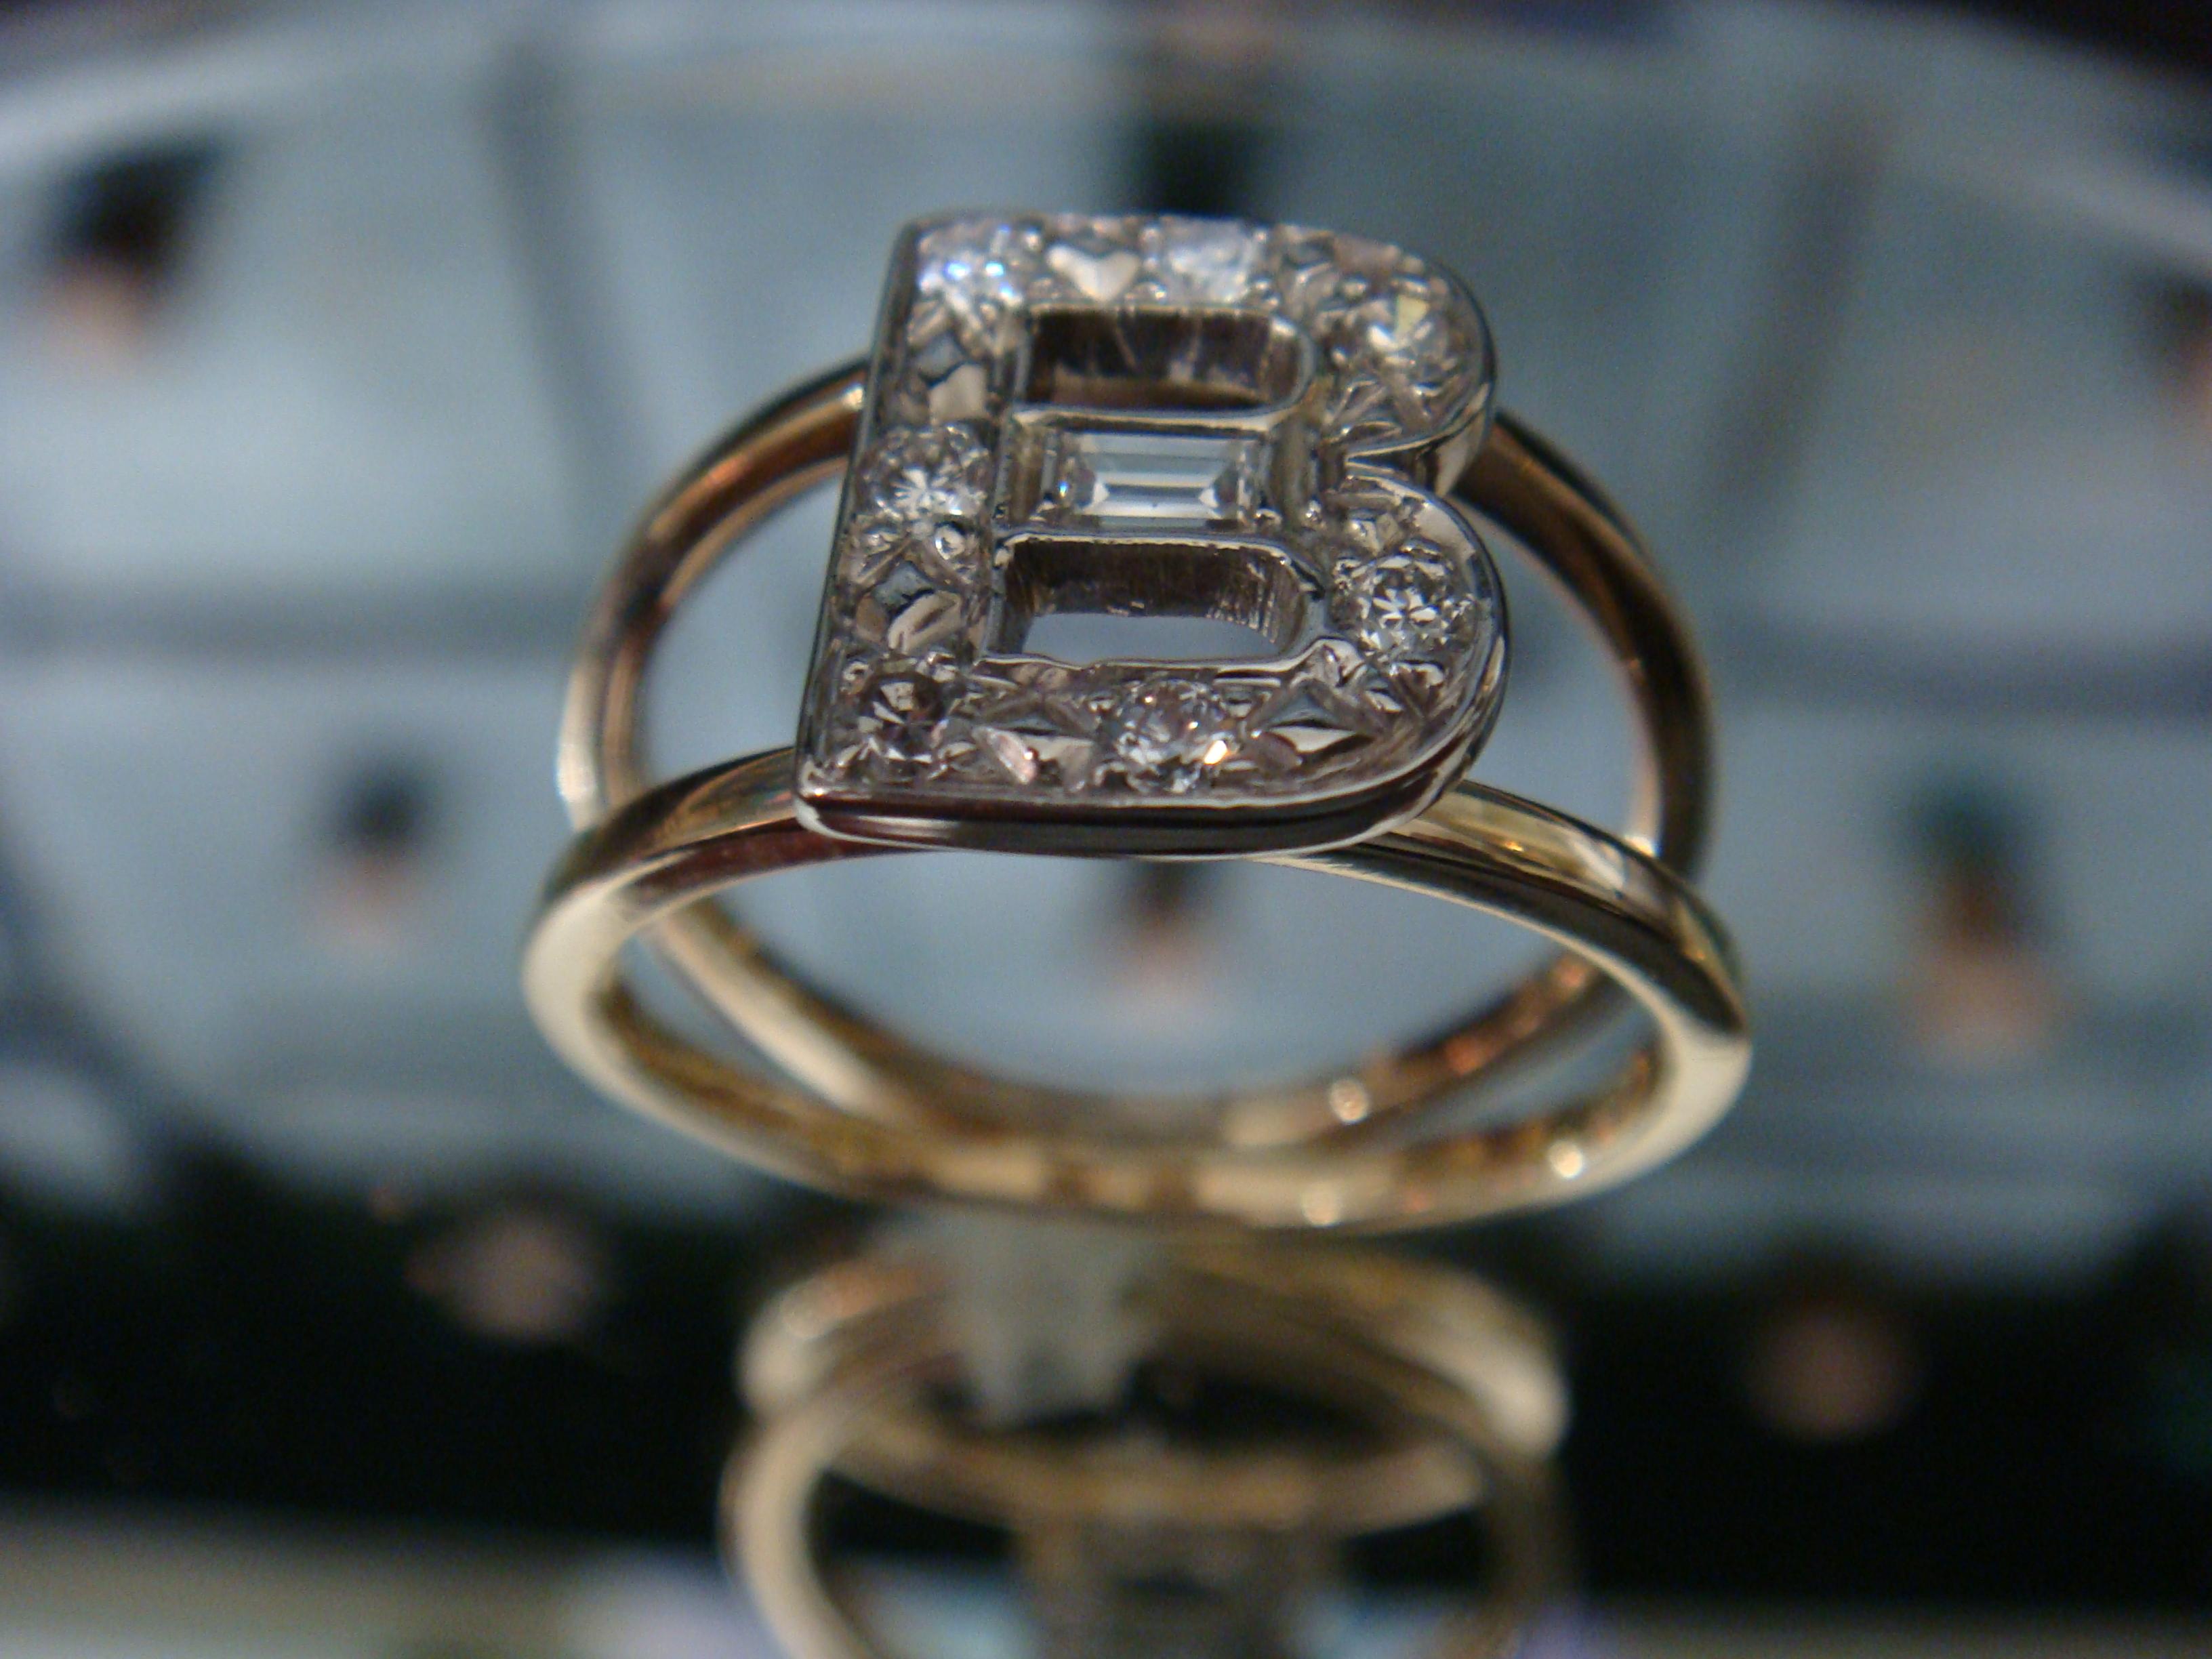 Make a ring